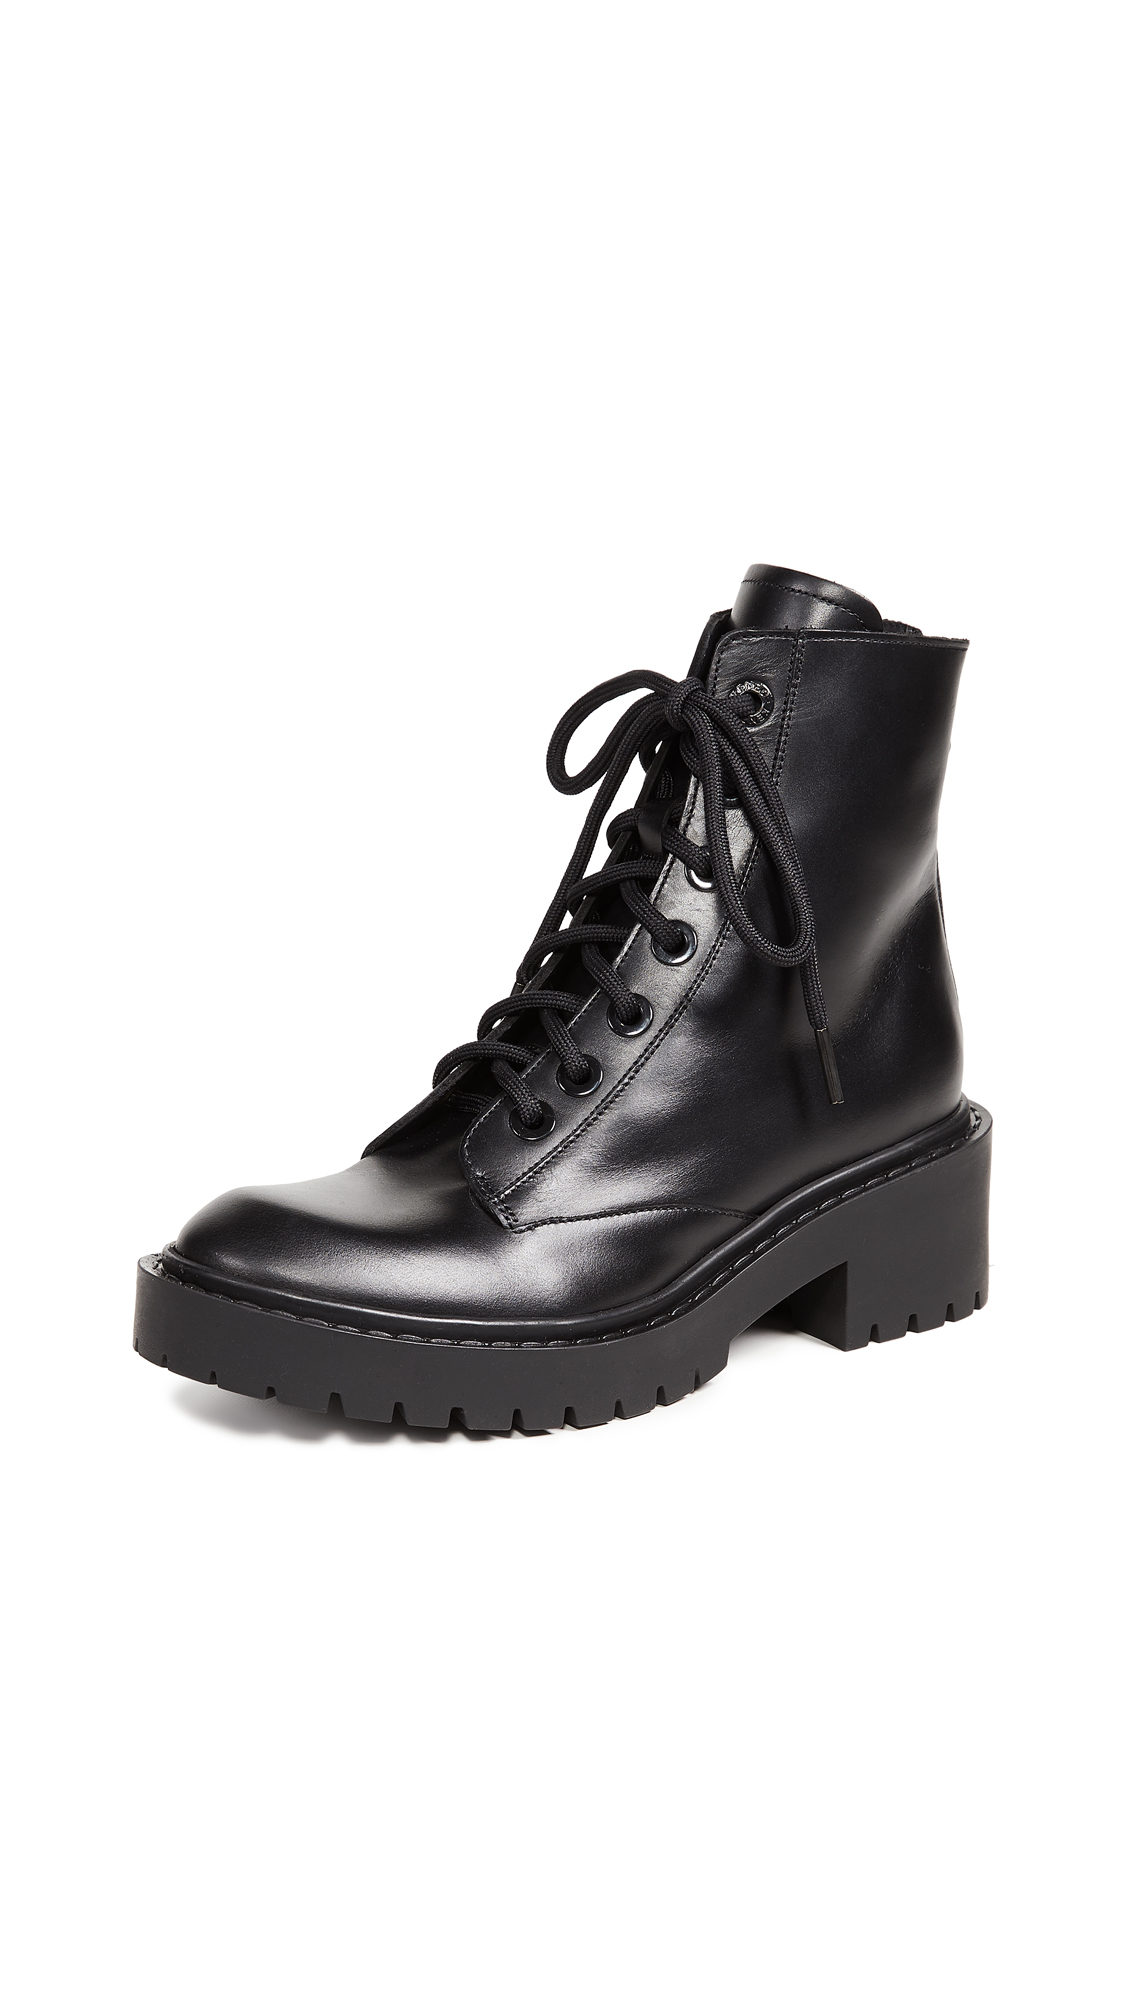 KENZO Pike Boots - Black